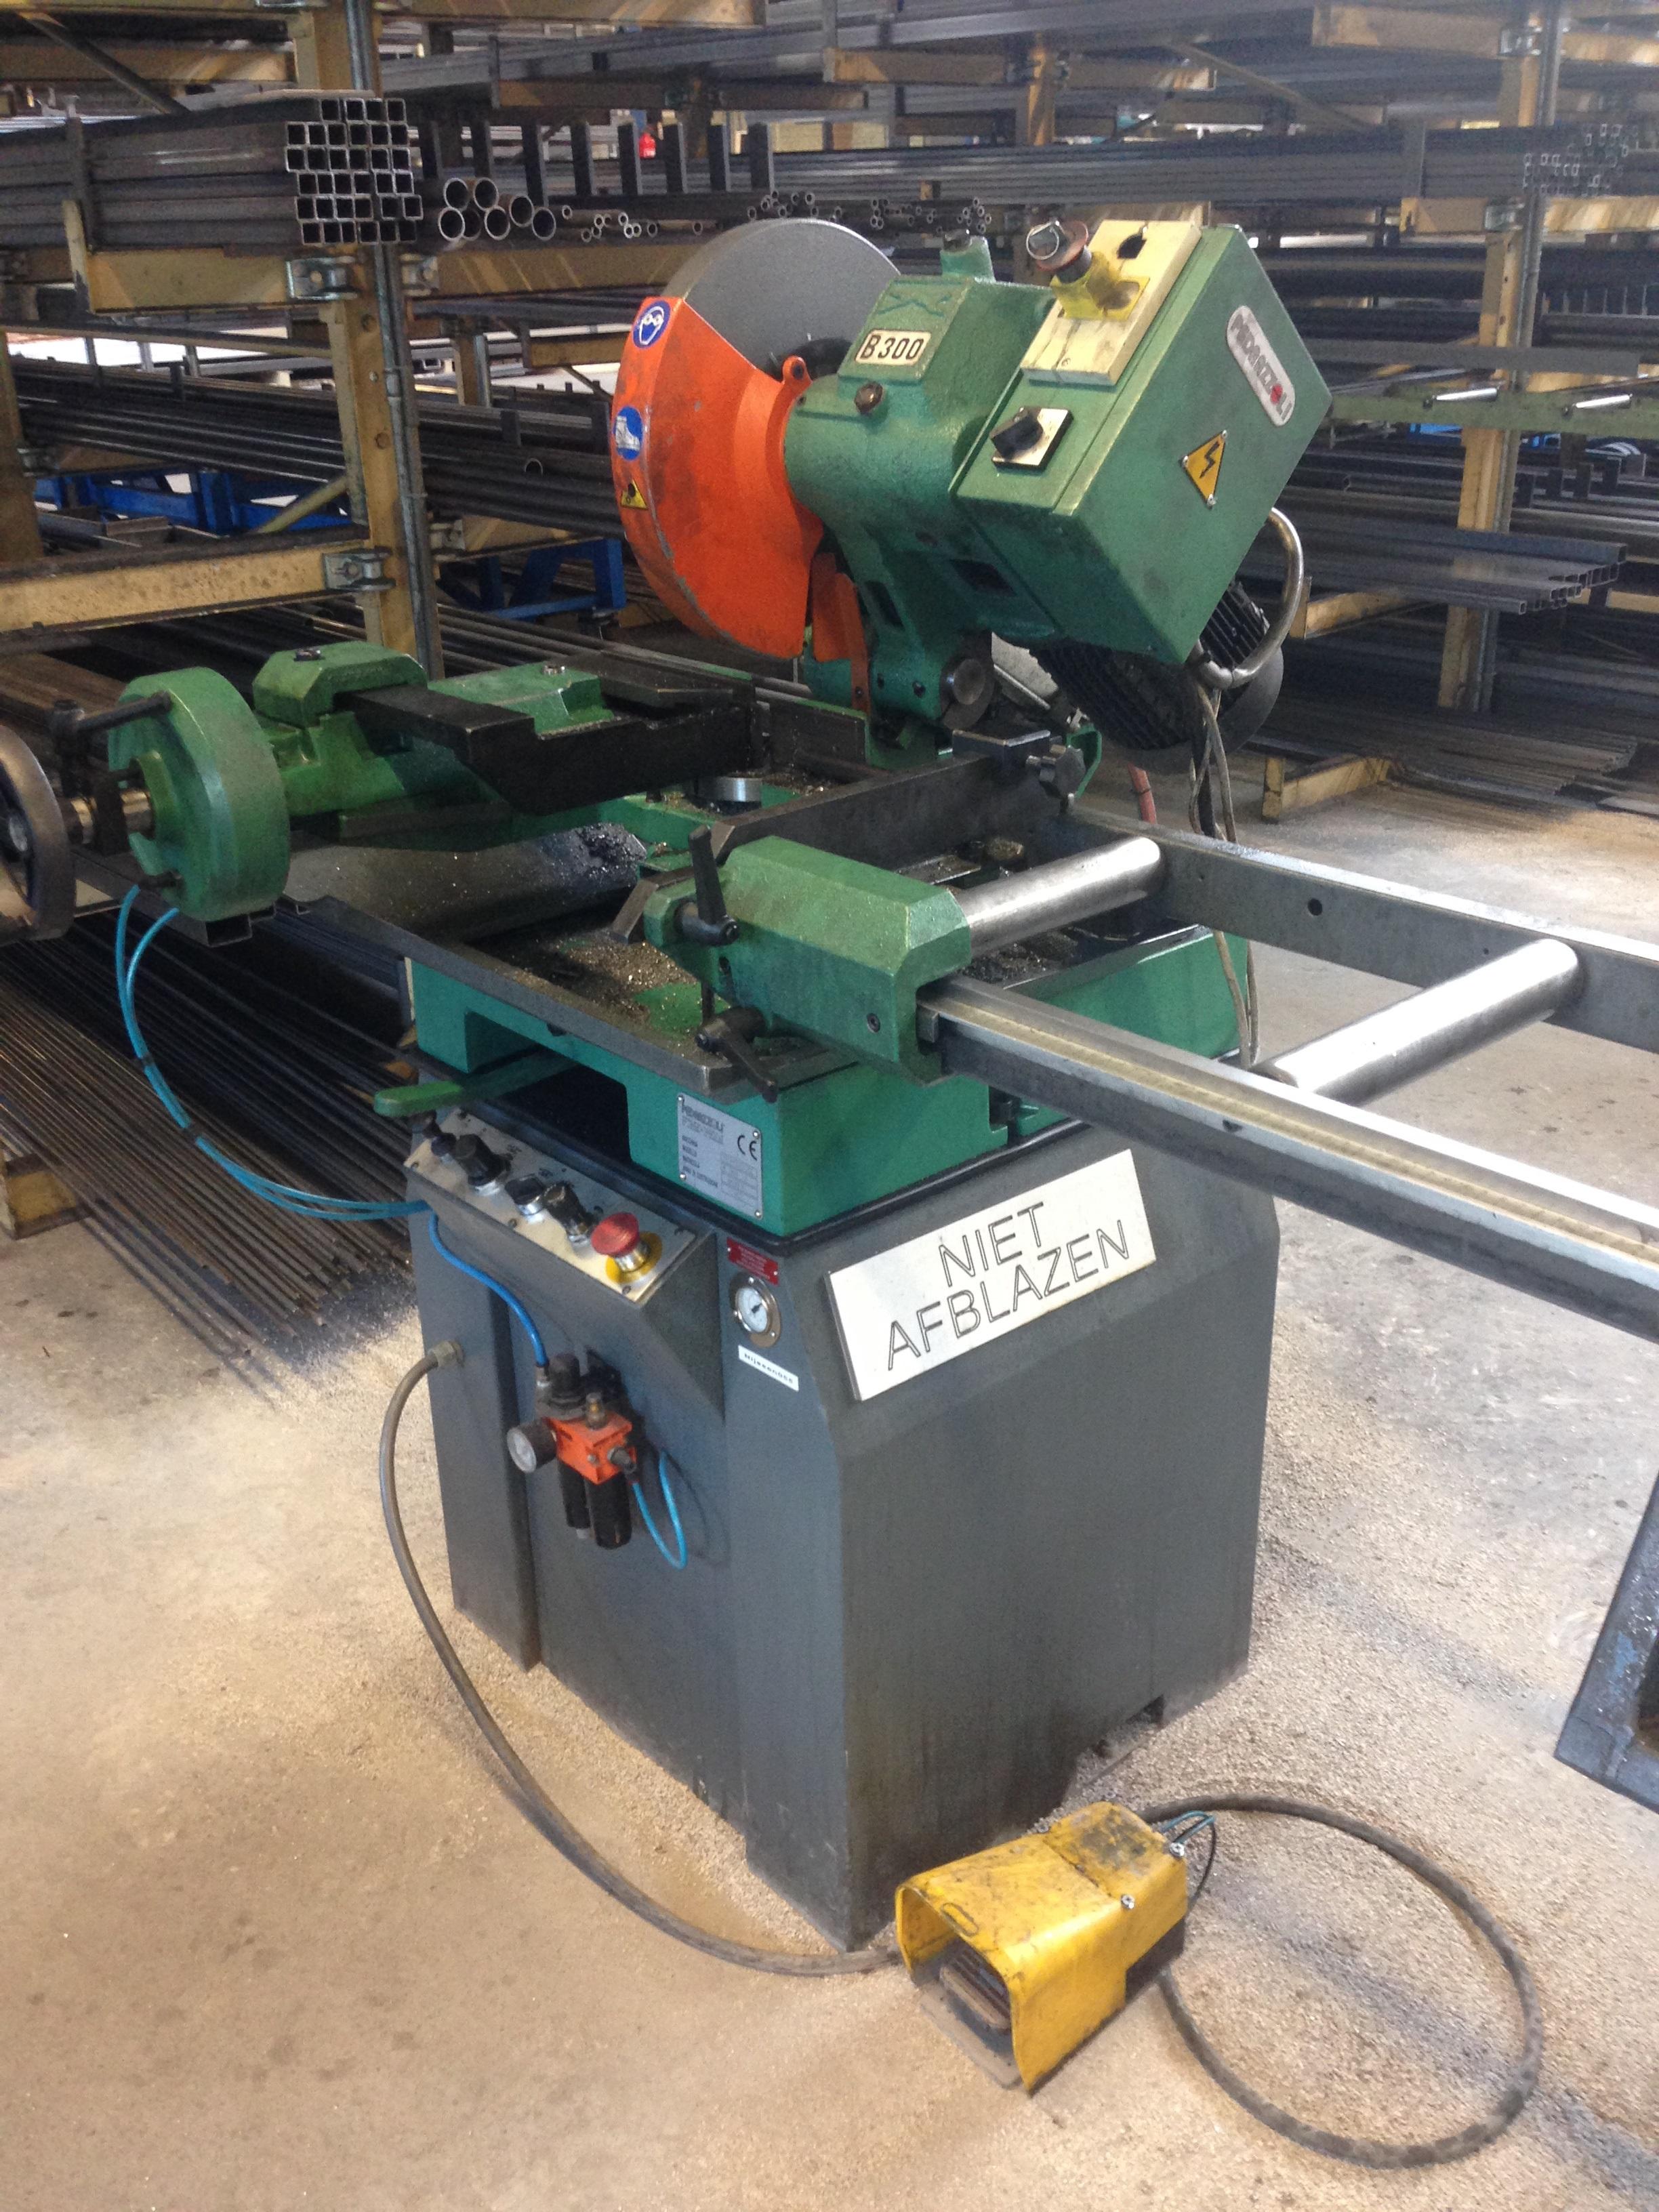 Metall metaal plaatbewerking machines industrieel plaatbewerkingsmachine plaatbewerkingsmachines pijpenbuiger primecut